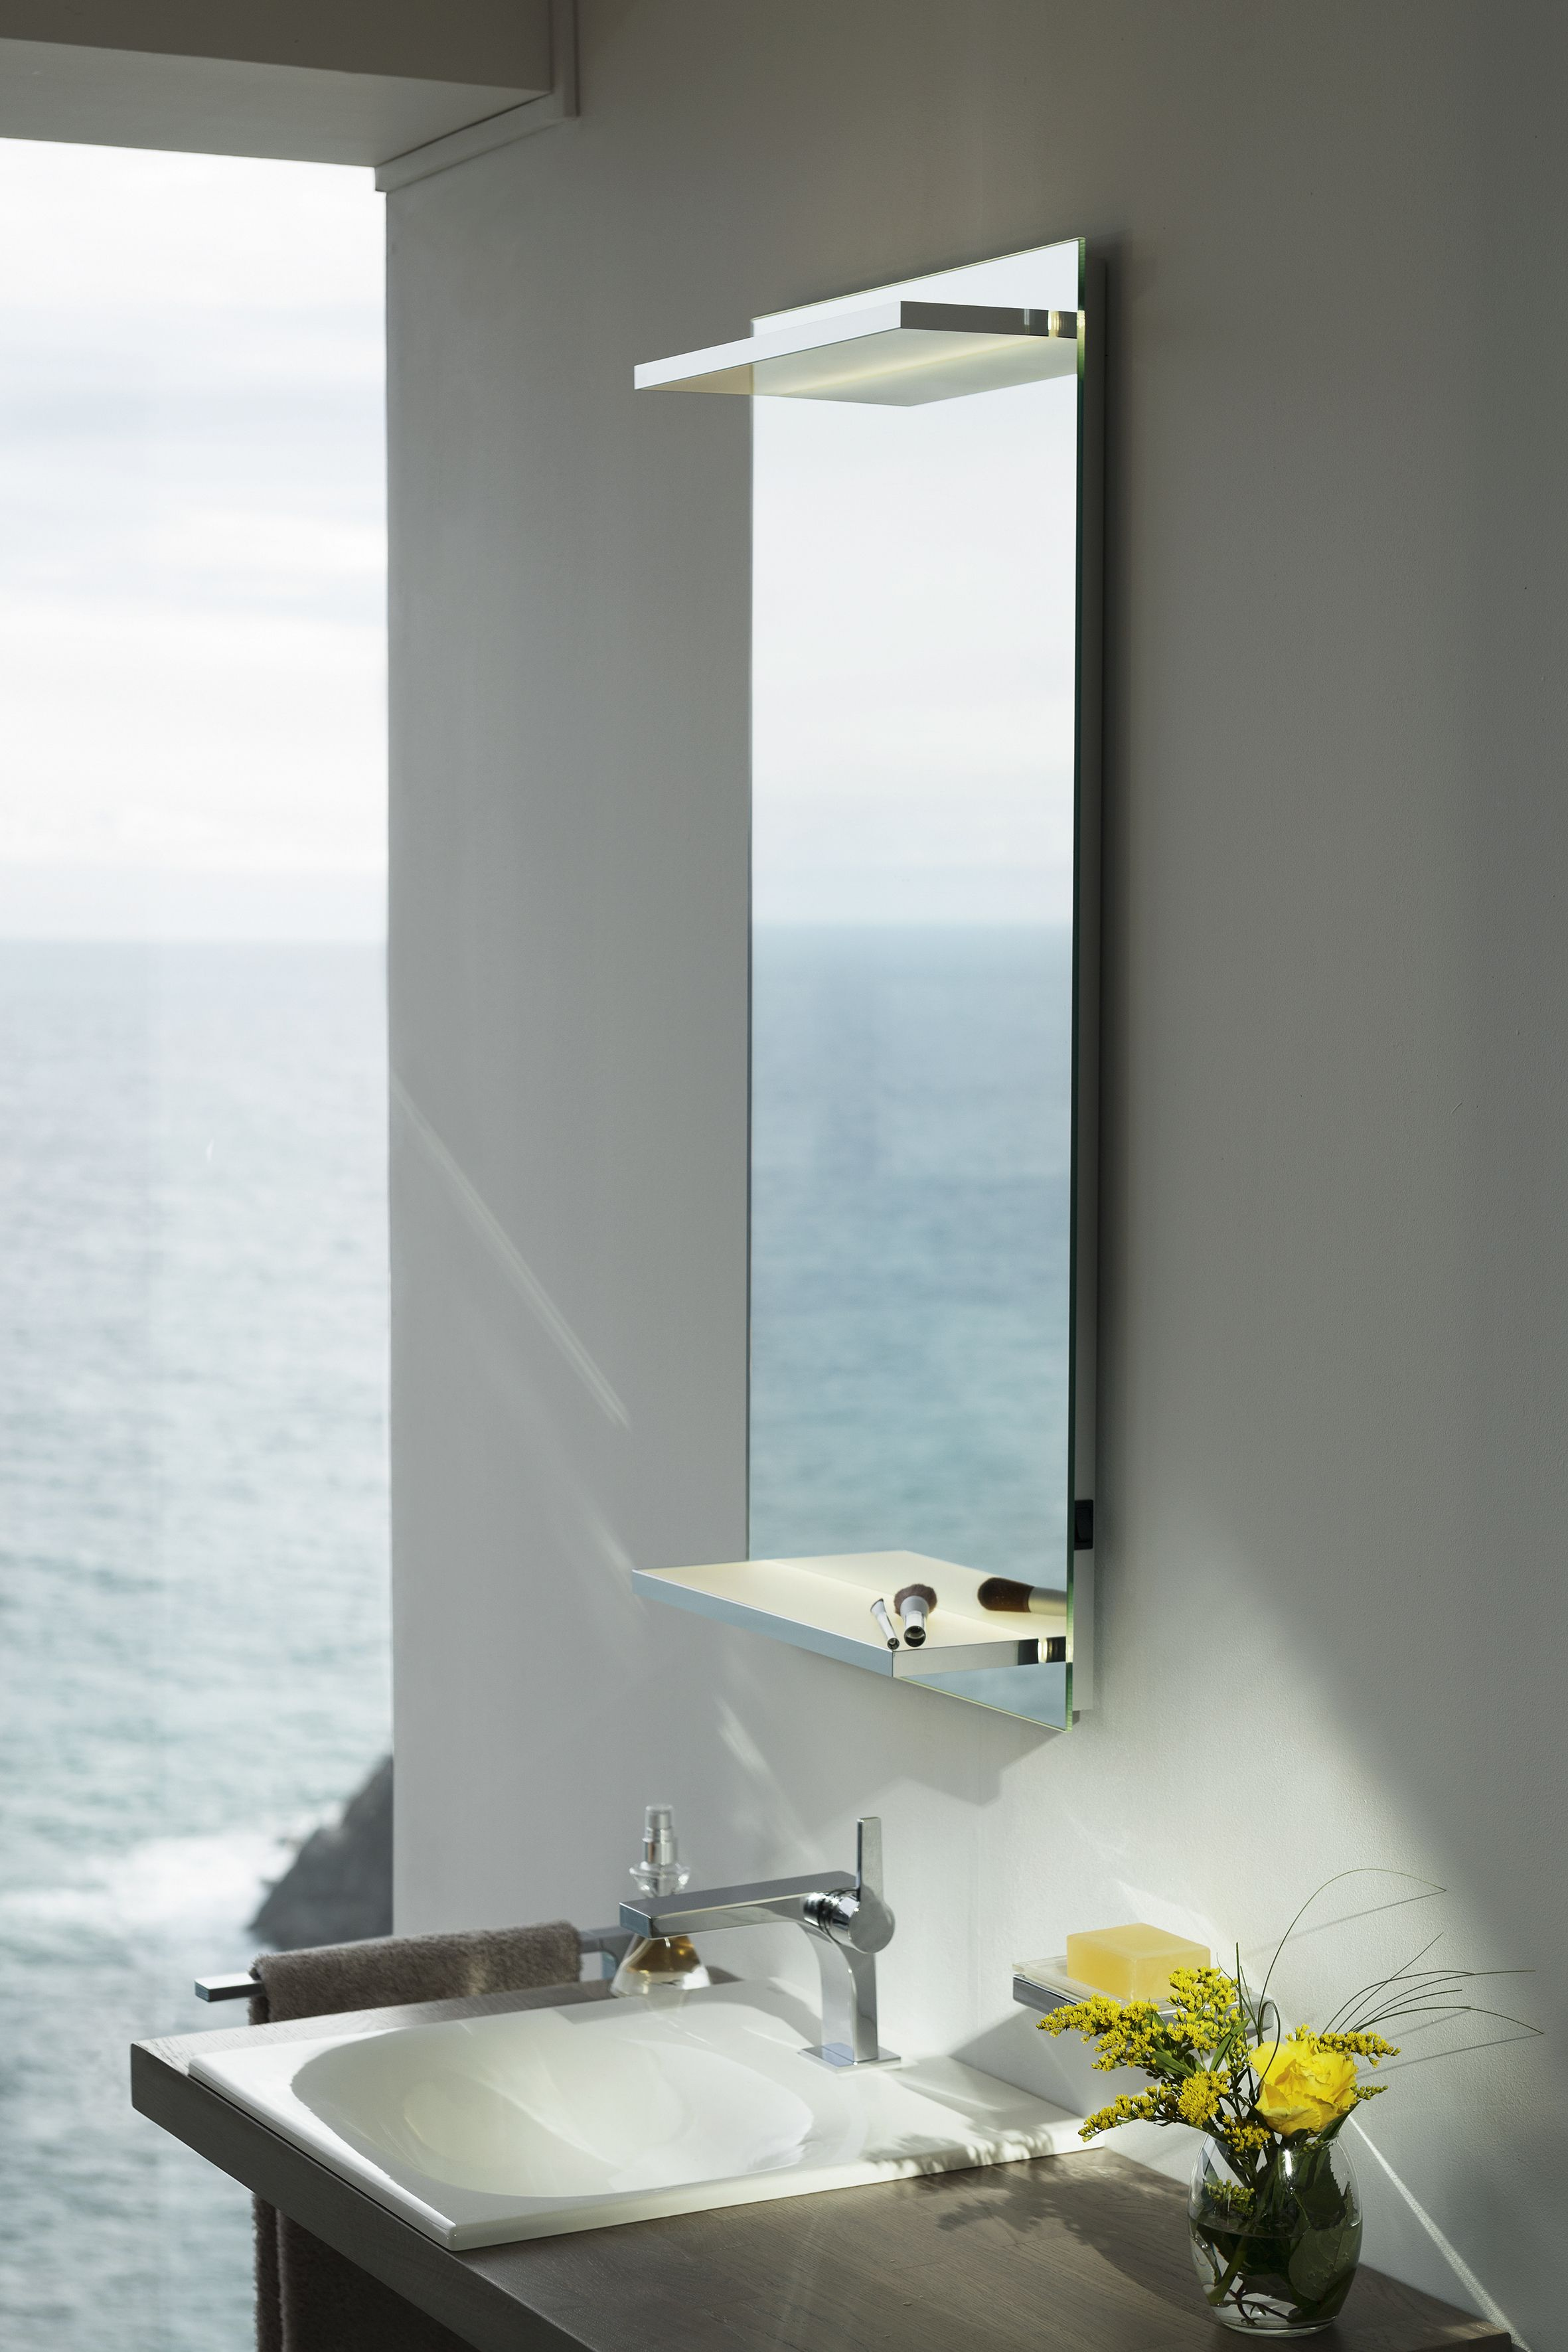 Marque Bianco Salle De Bain ~ keuco edition 11 bathroomfurniture architecture design home